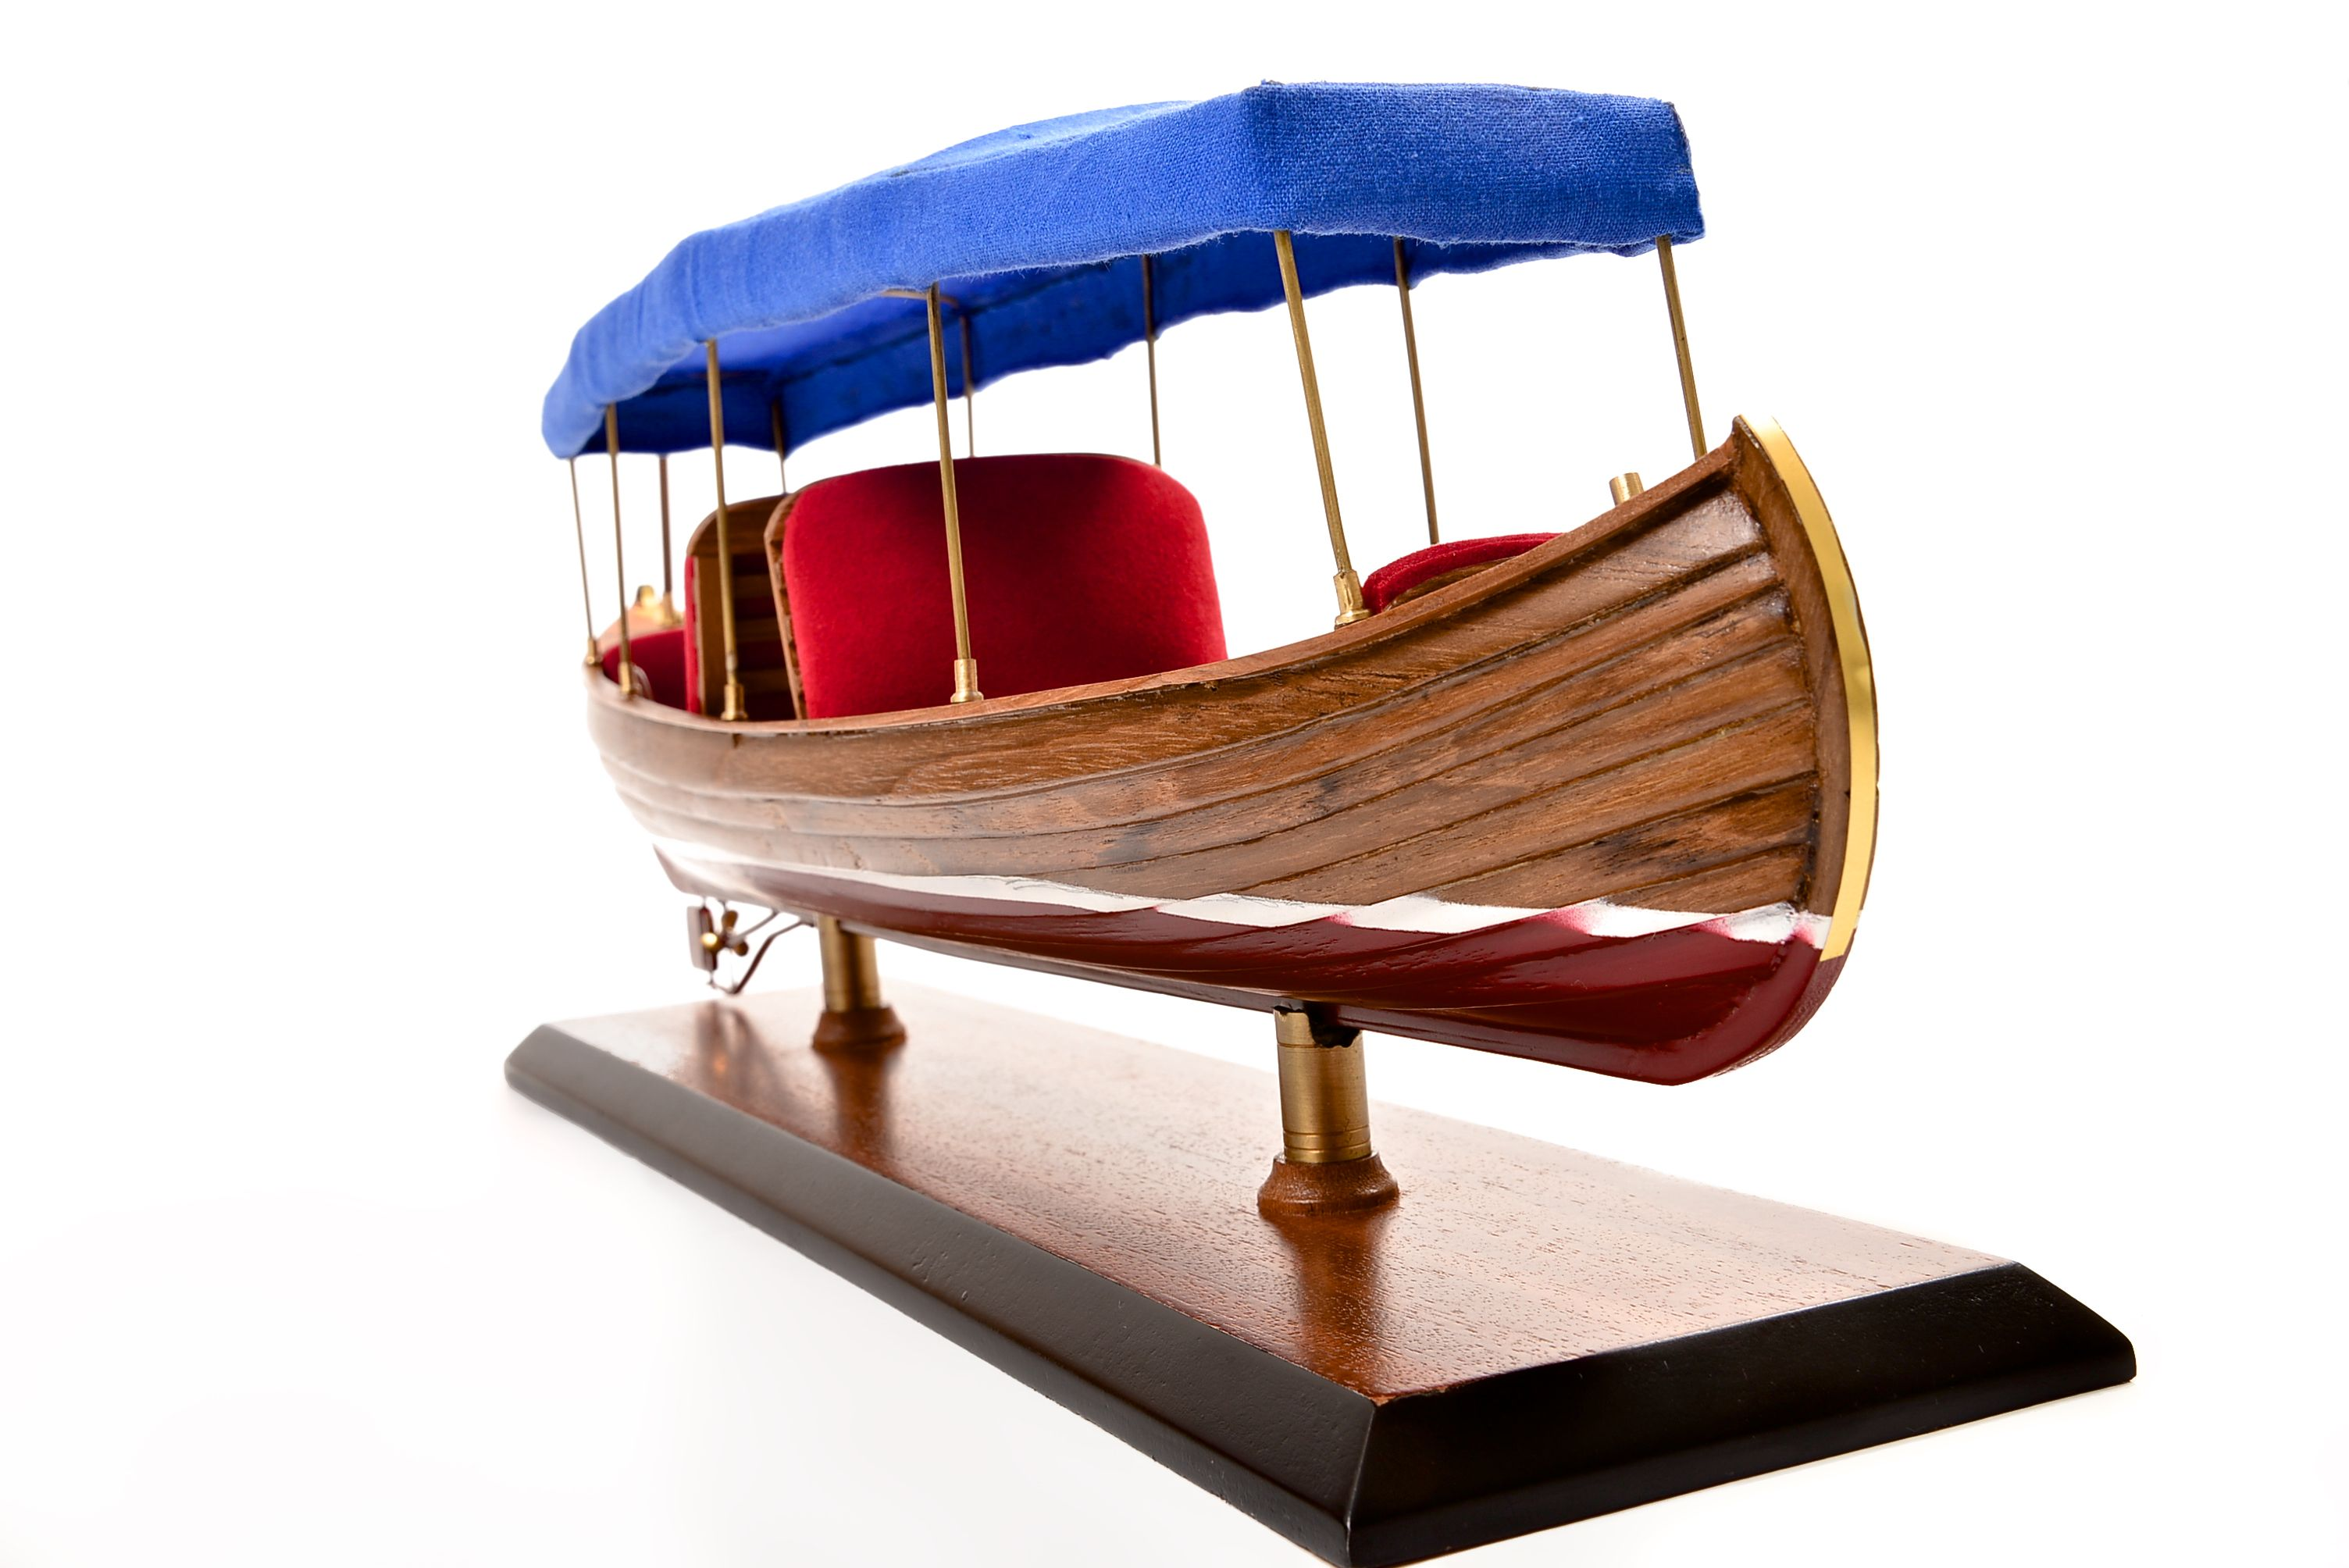 1865-11242-Liddesdale-Electric-Canoe-1920